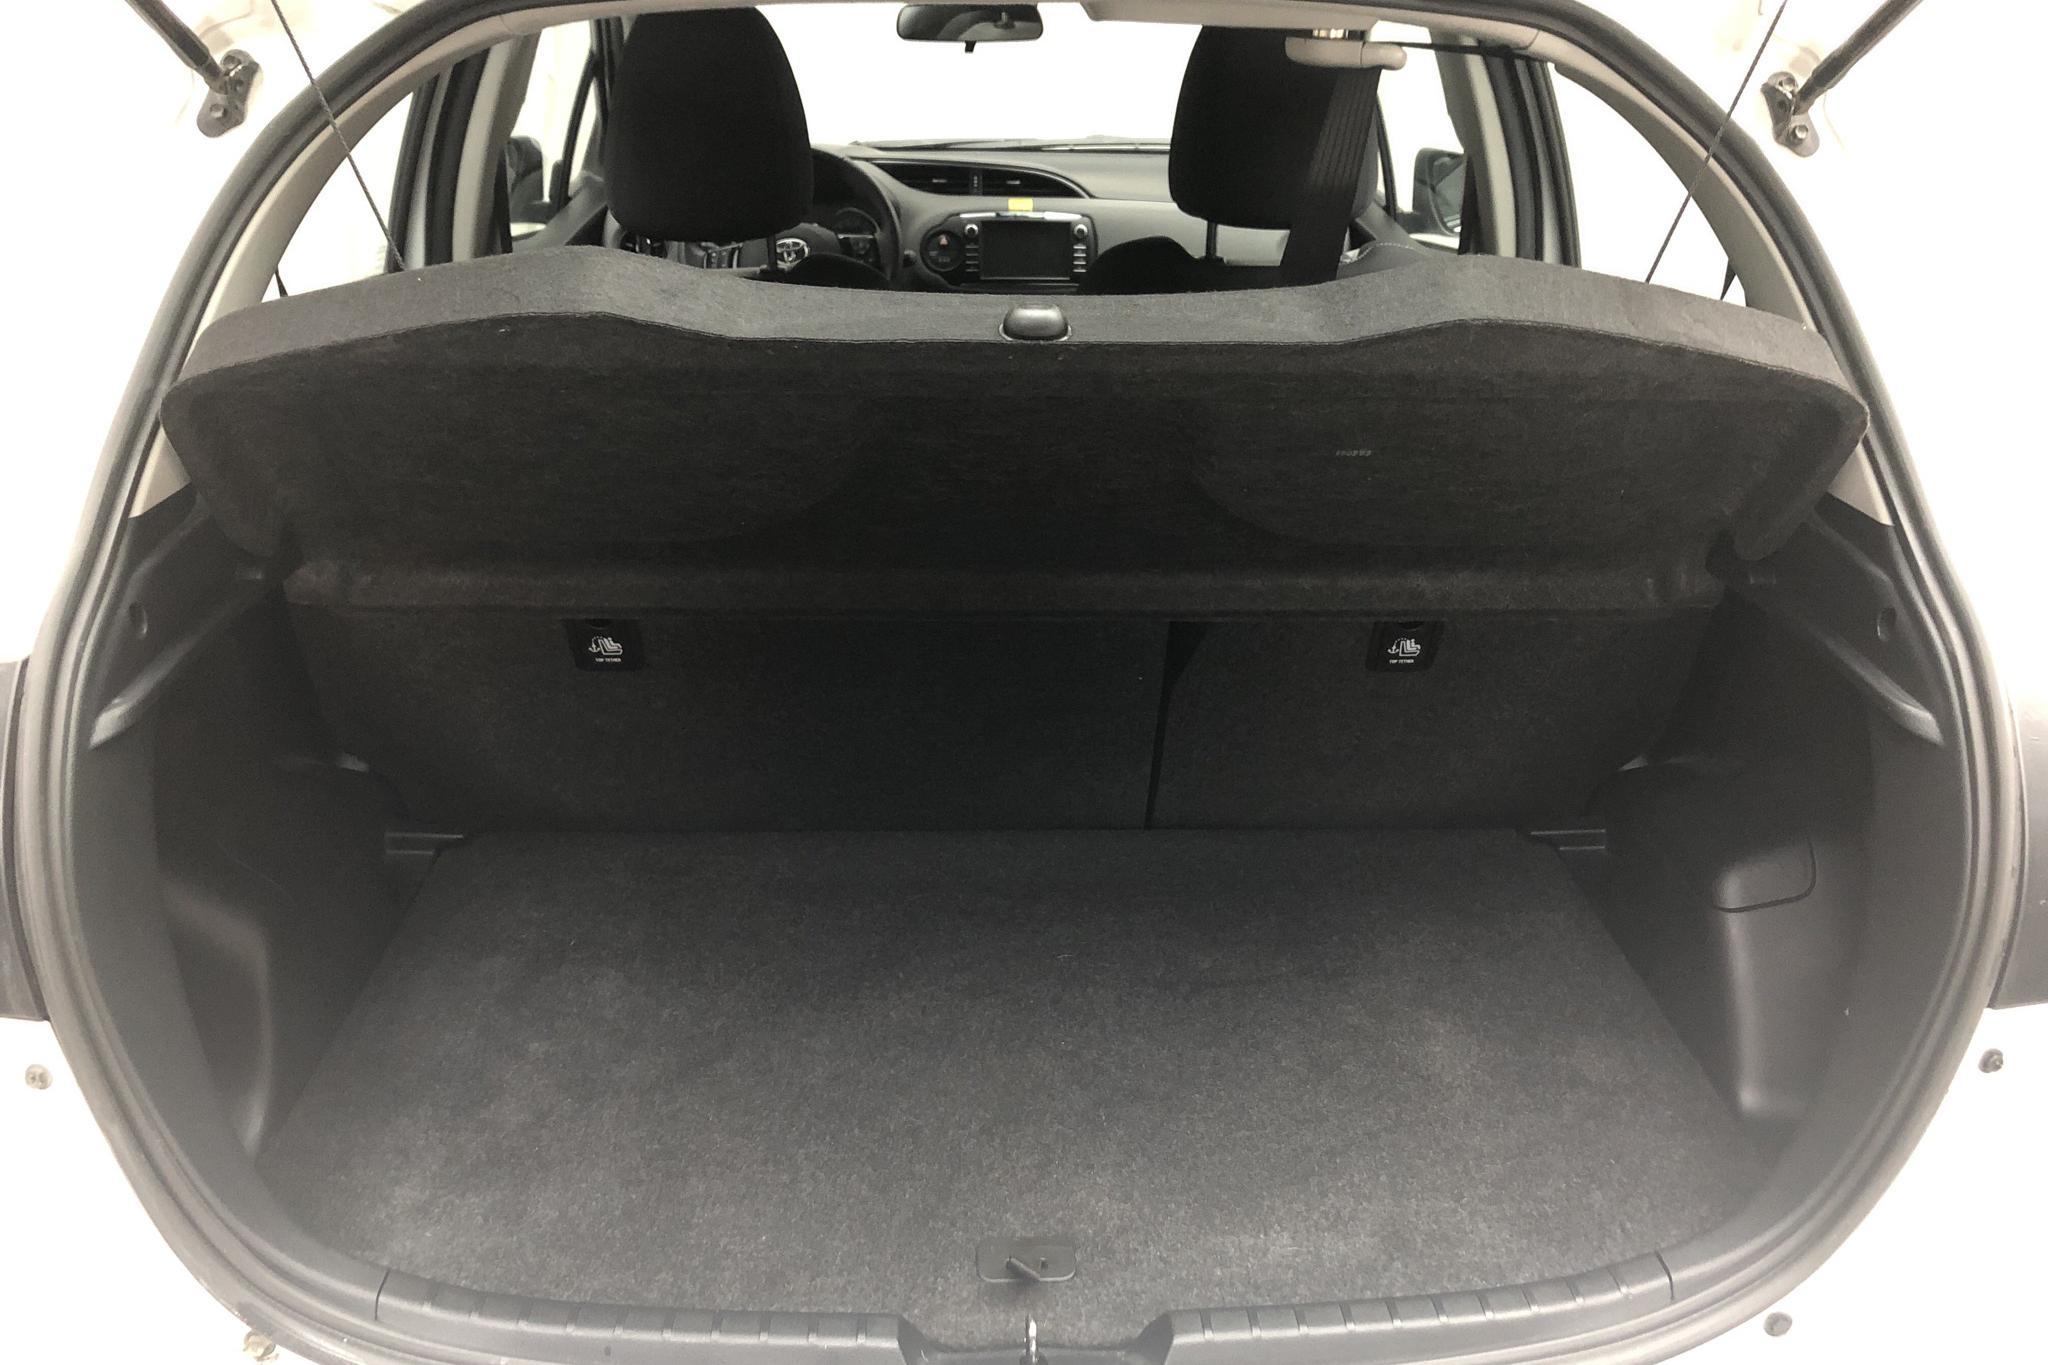 Toyota Yaris 1.5 Hybrid 5dr (101hk) - 3 759 mil - Automat - vit - 2018